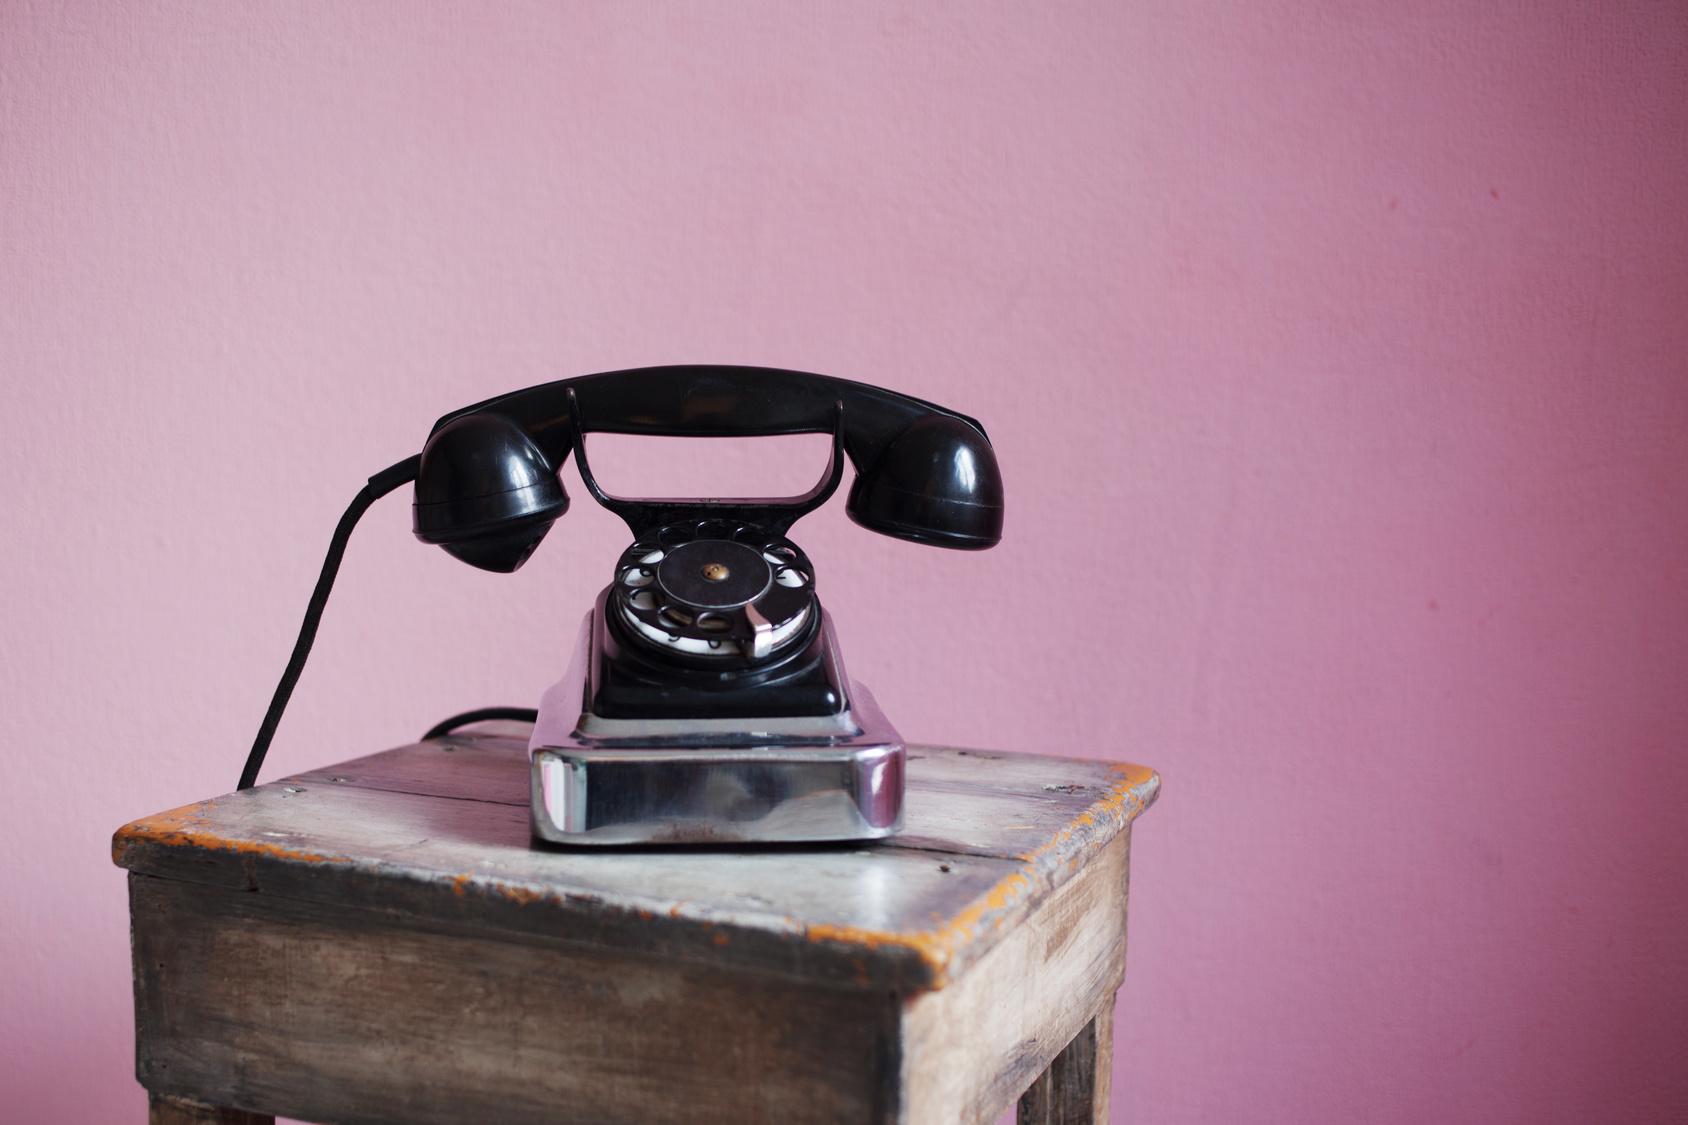 Telefon mit Drehscheibe zum kontaktieren des Kosmetikstudio Salamandra Kaufbeuren.